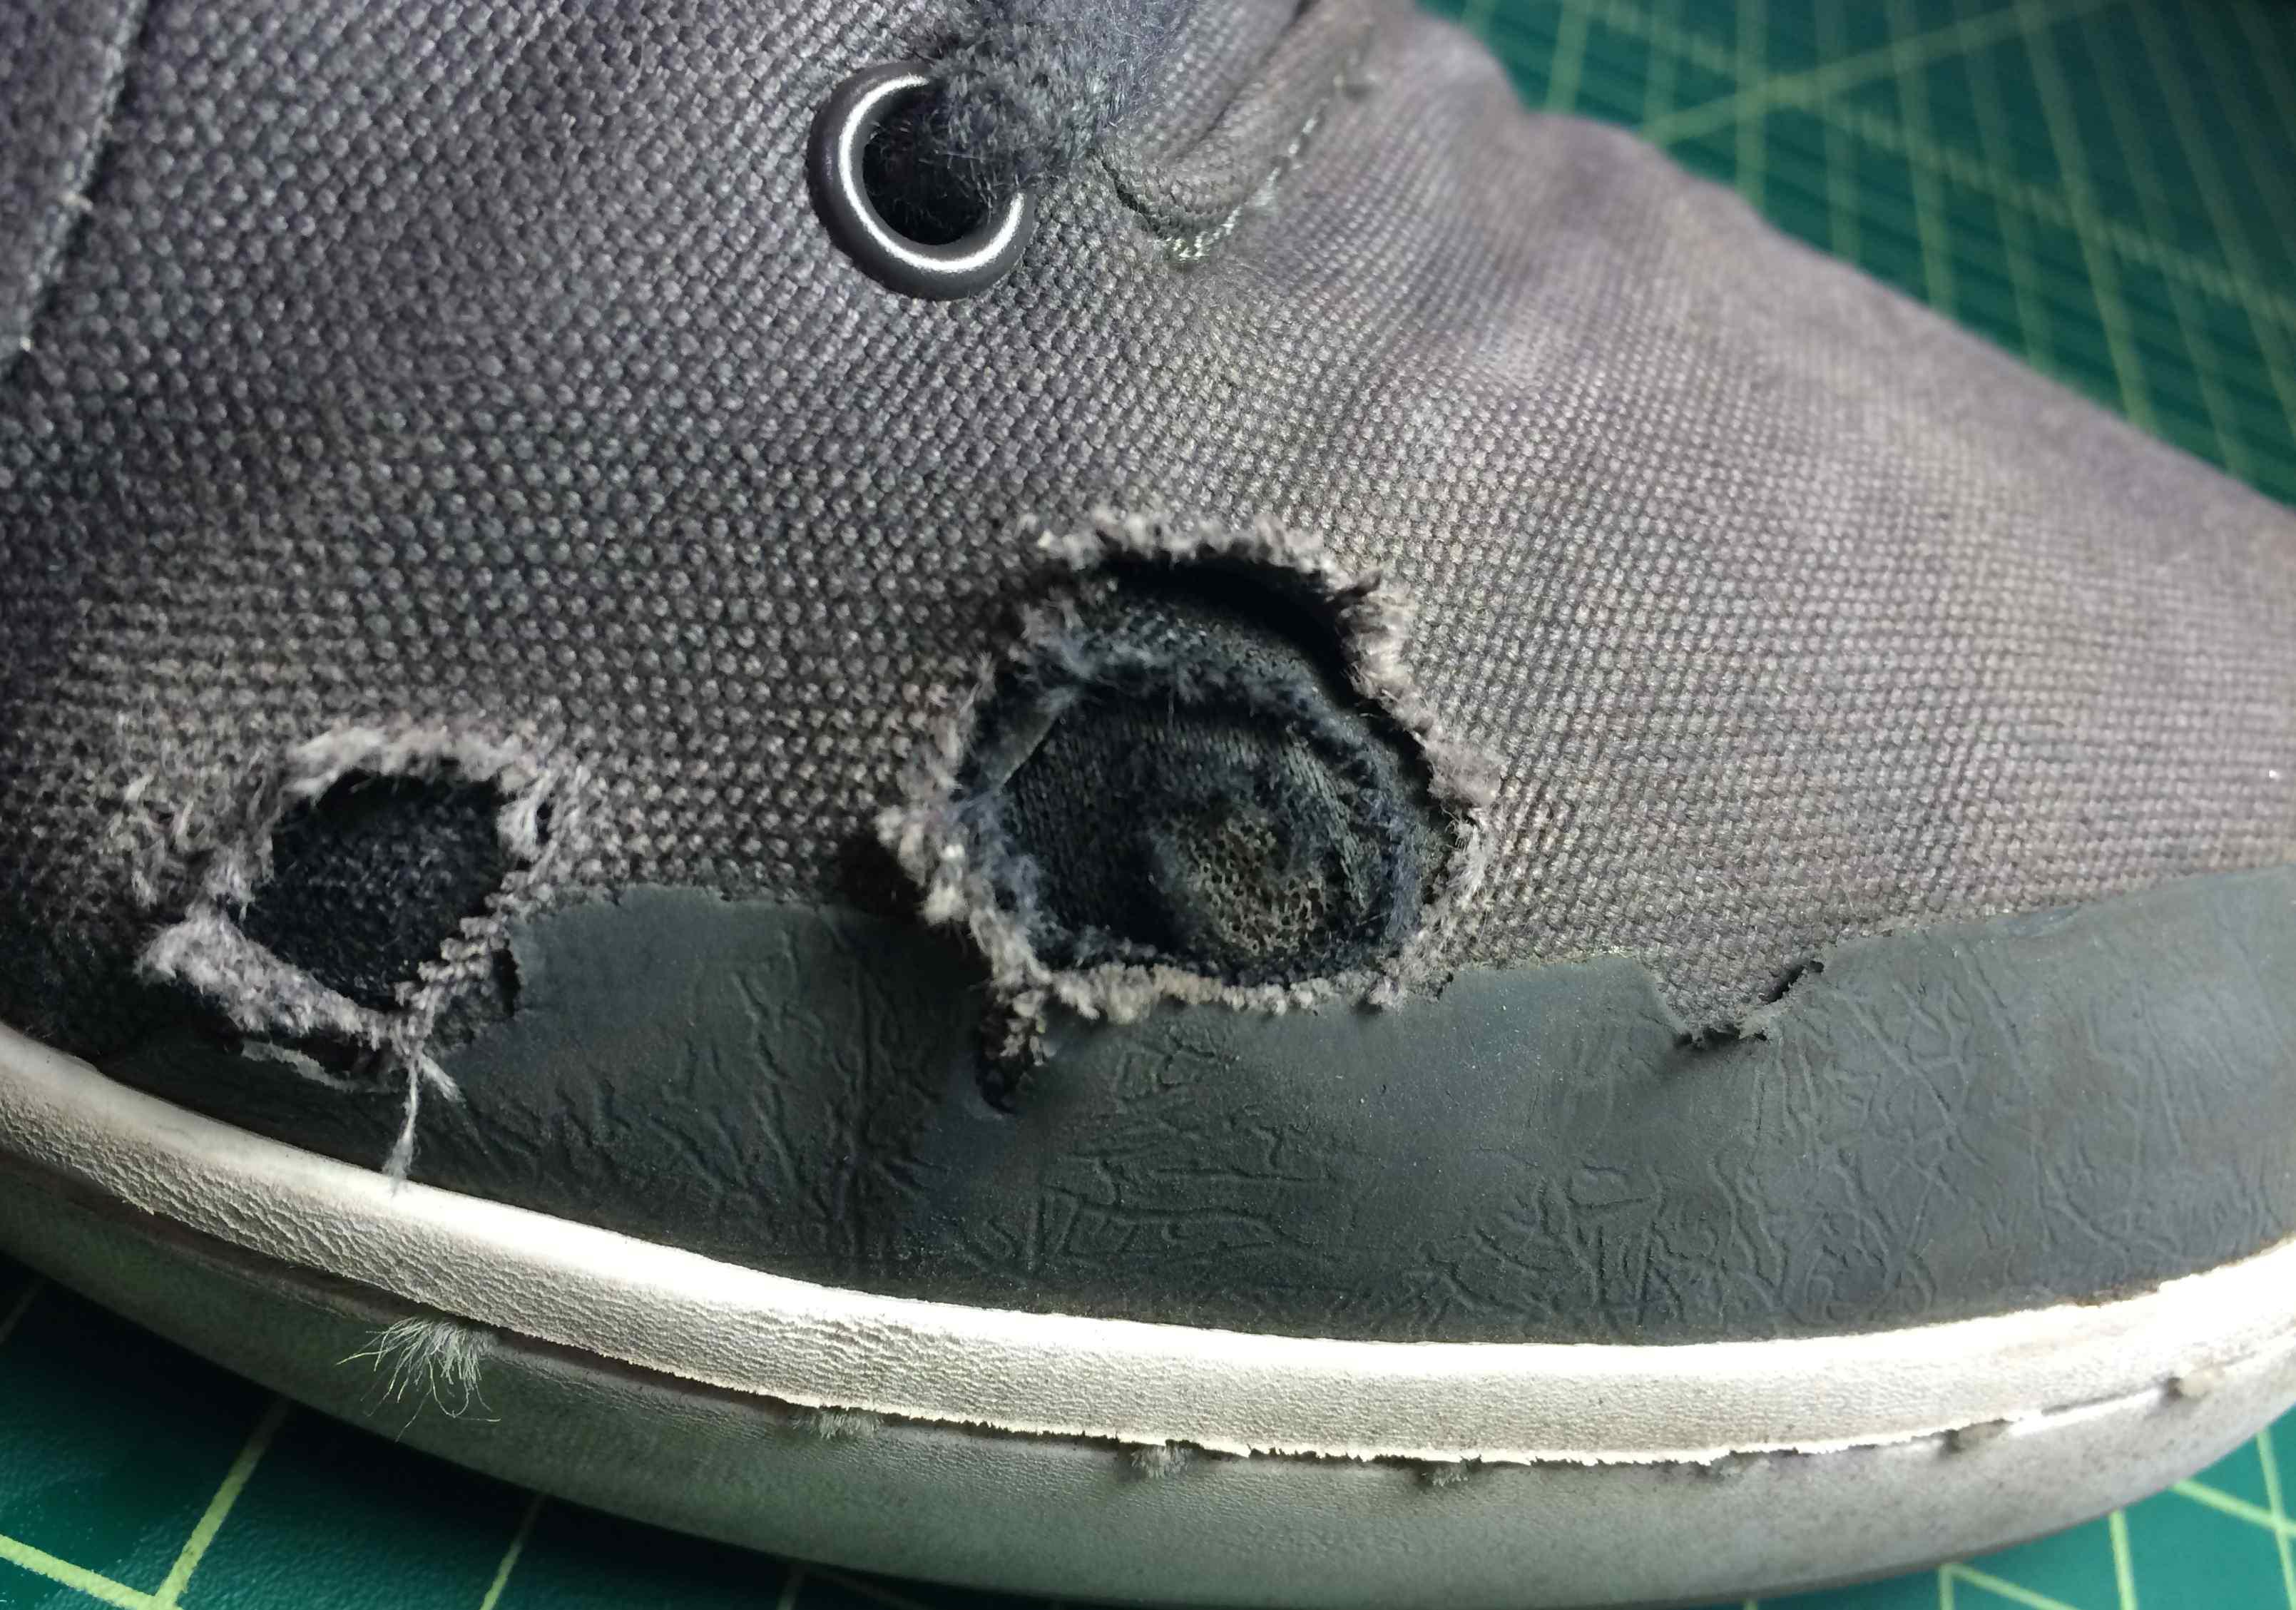 close look at Etnies technology vegan skateboard shoes